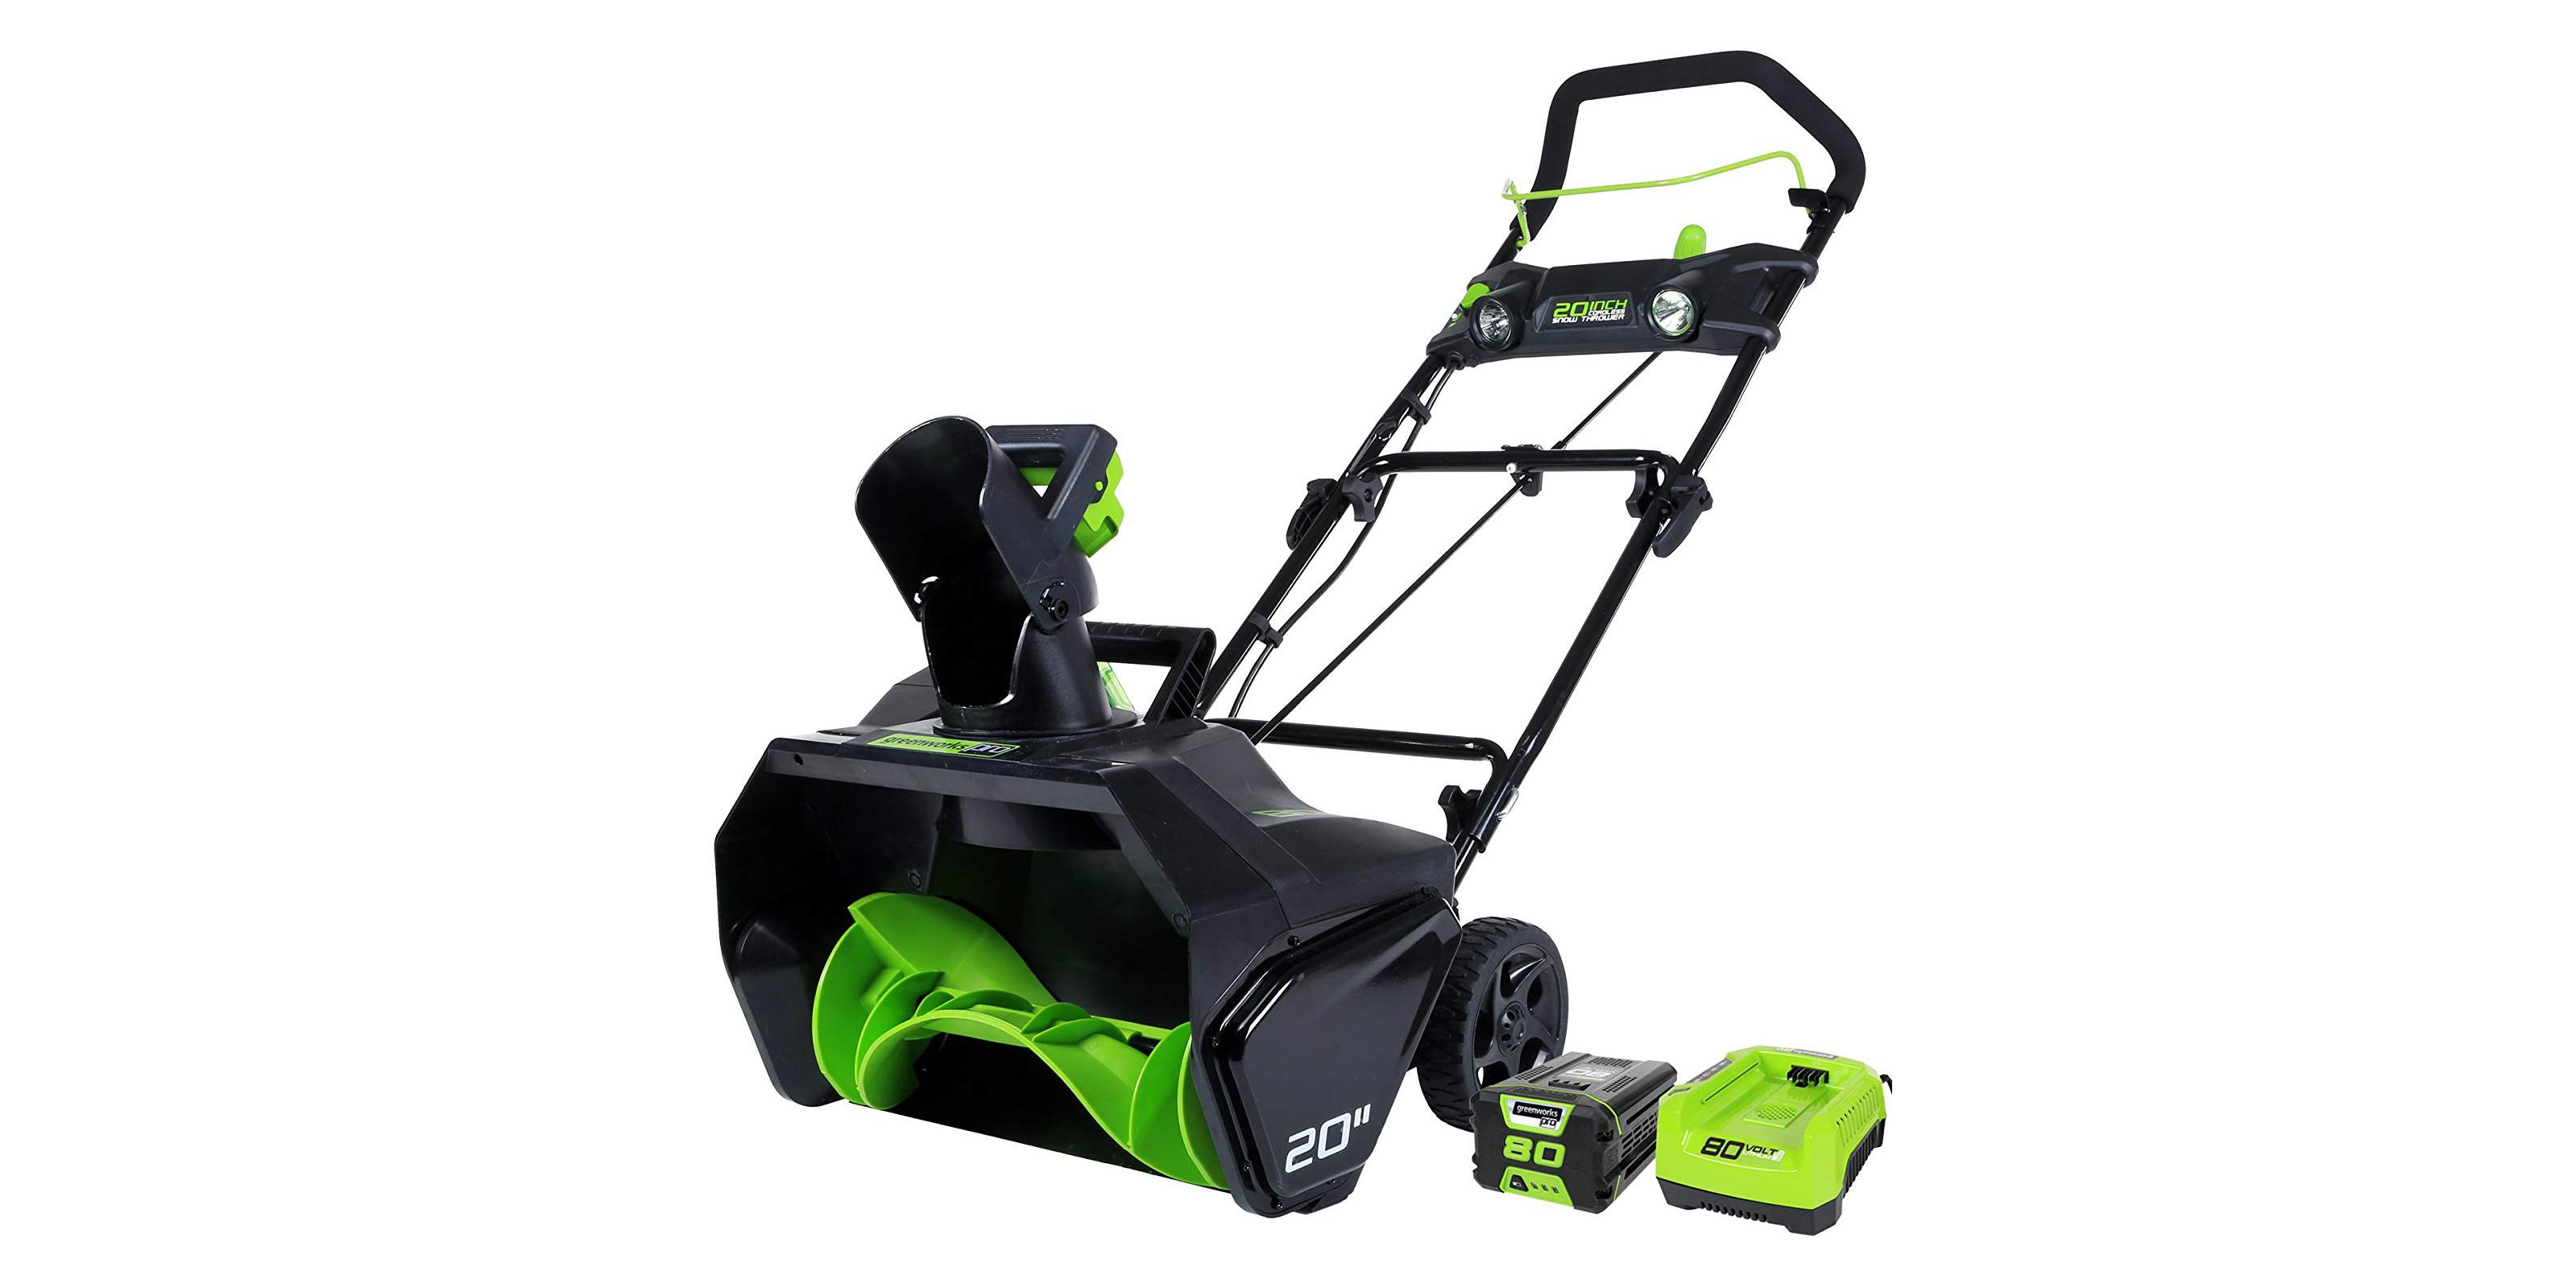 Green Deals: Greenworks PRO 20-inch 80V Snow Thrower $263 (Reg. $325), more